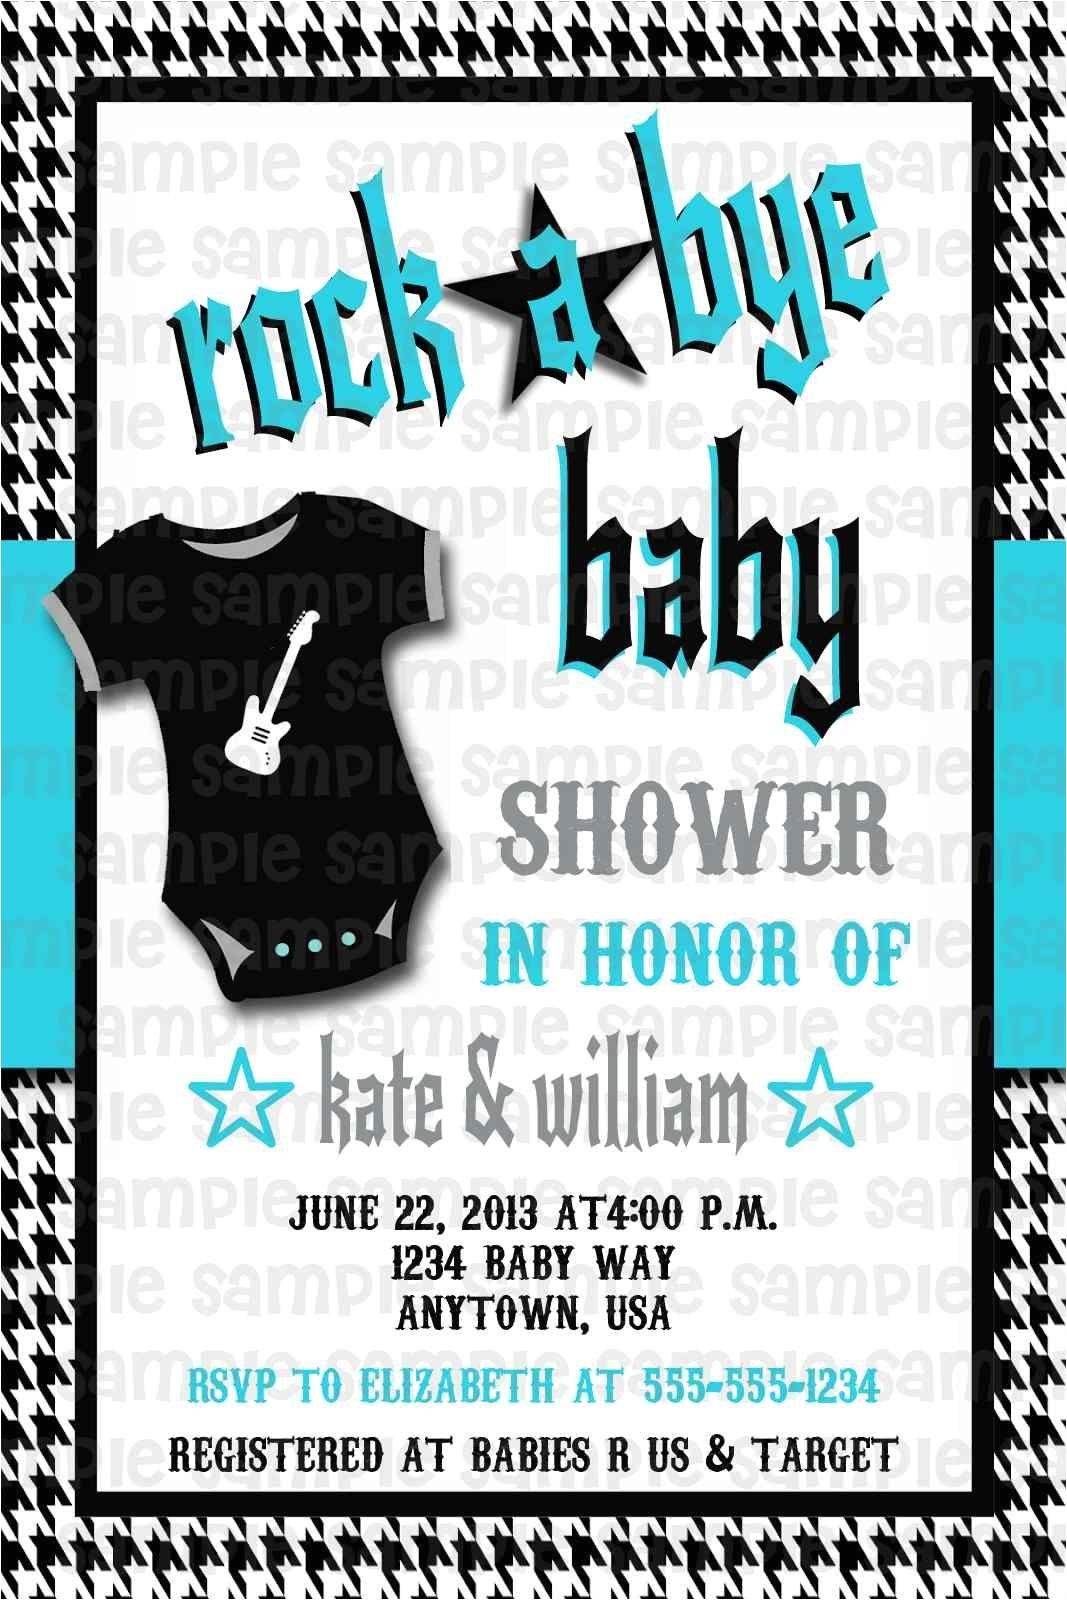 Rock N Roll Baby Shower Invitations Rockabilly Rock N Roll Rock A bye Baby Shower Invitation